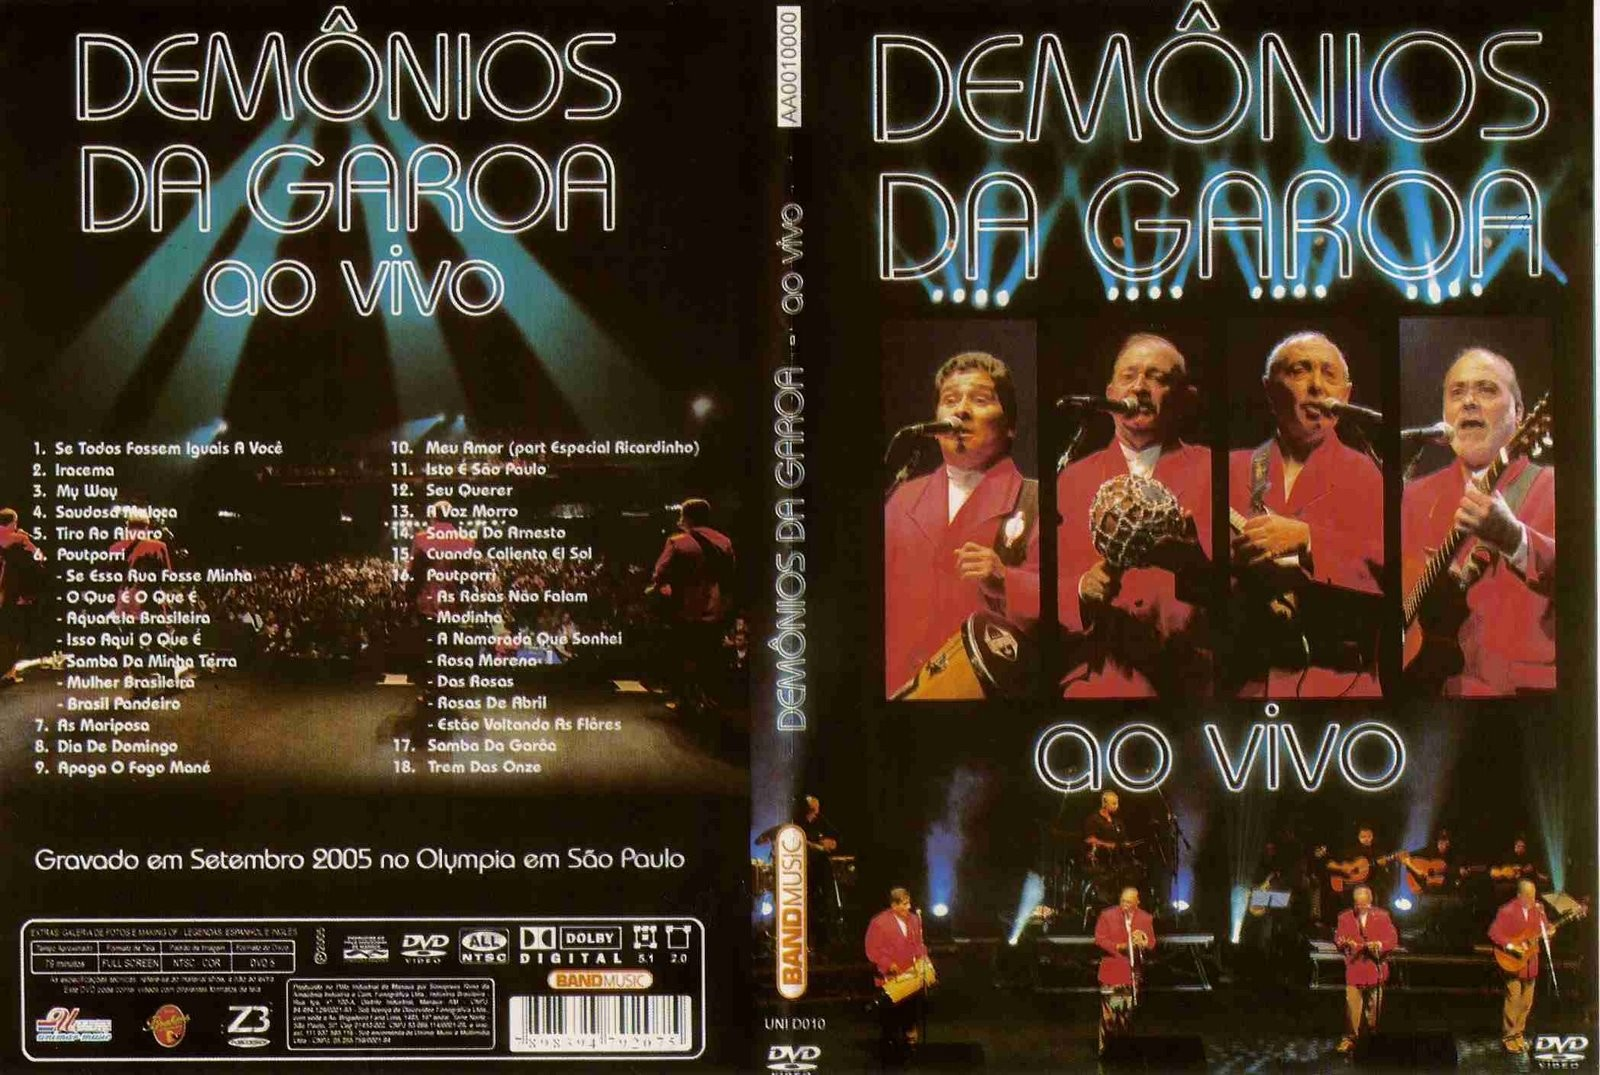 [Demonios+Da+Garoa+-+Ao+Vivo.jpg]